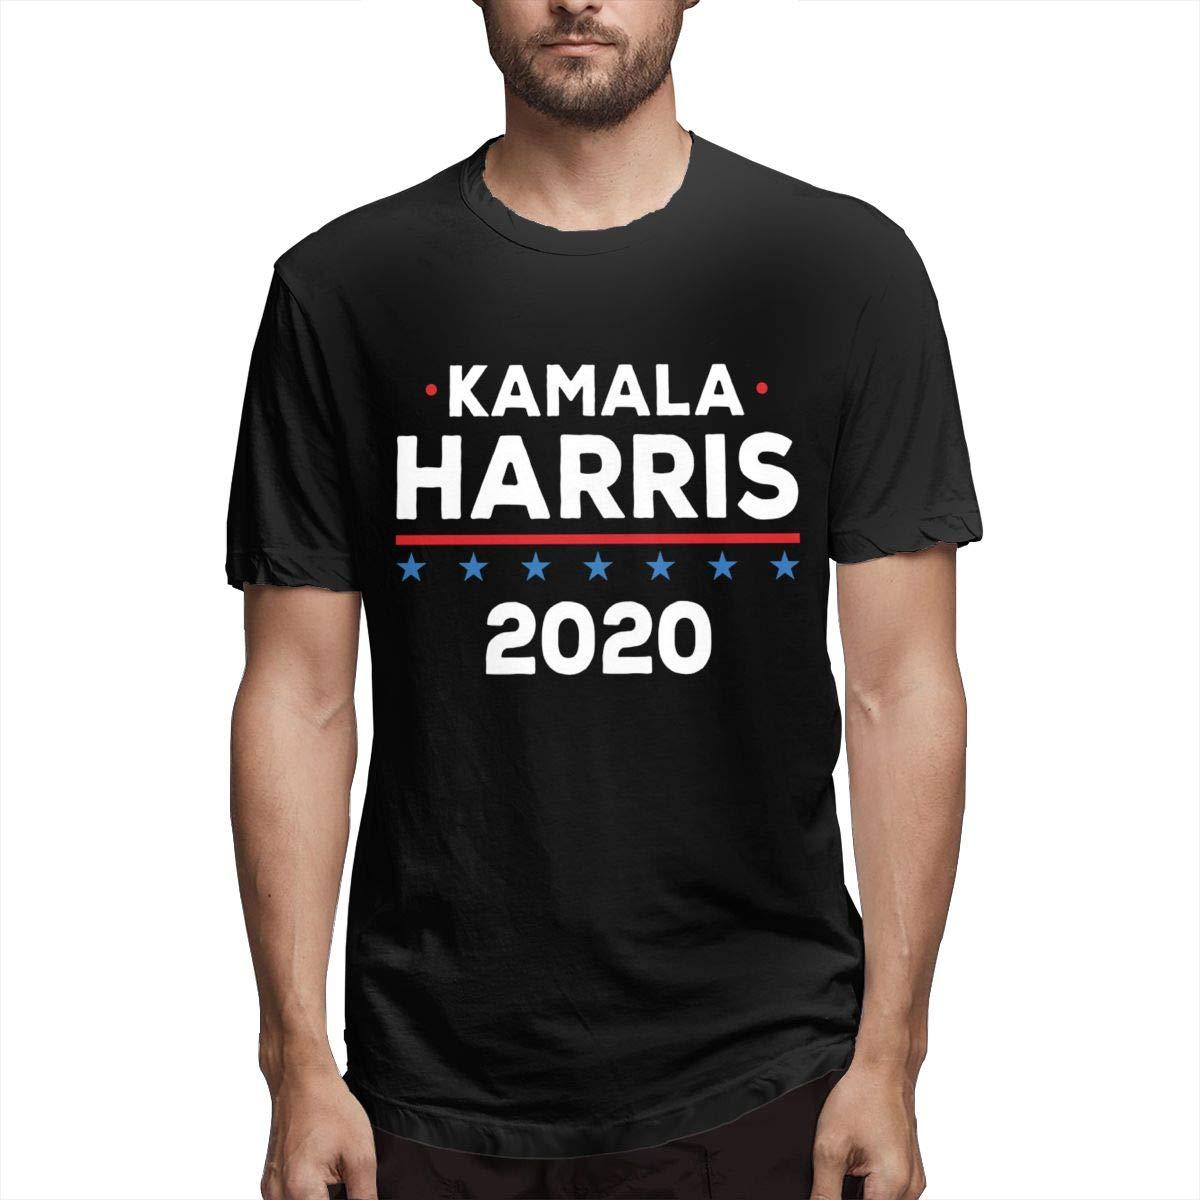 Dahwy Kamala 2020 Harris President Campaign Election Fashion S T Shirt 1623